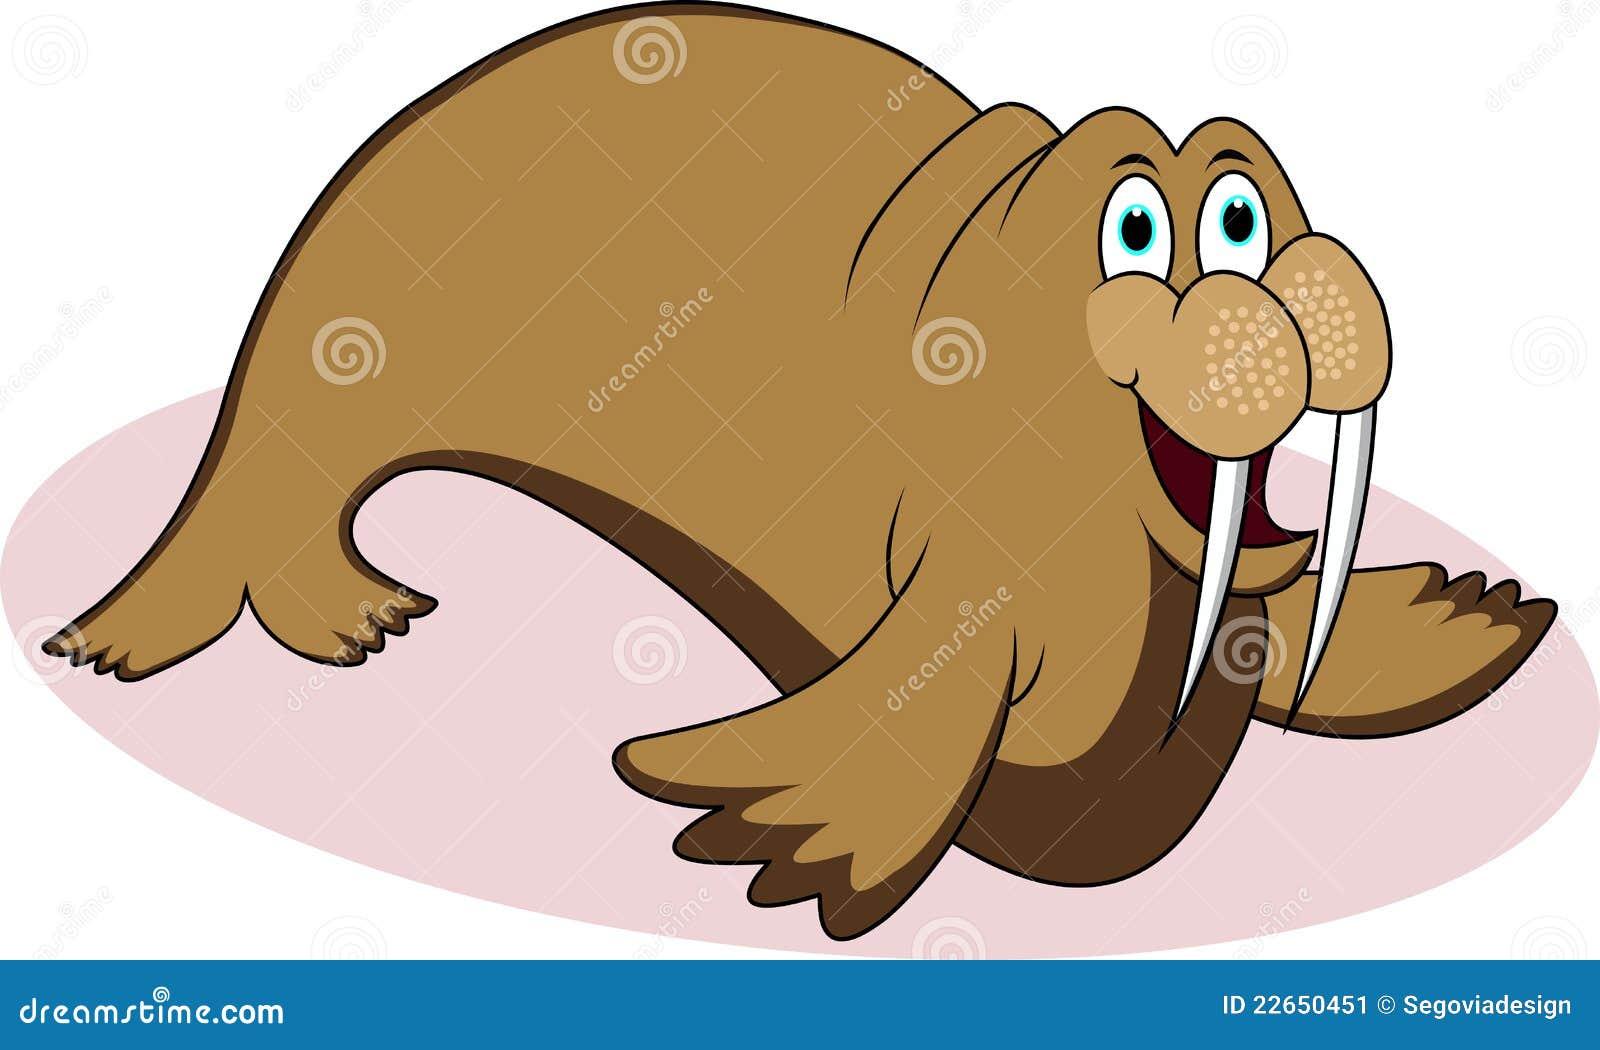 Funny Walrus Cartoon Stock Image - Image: 22650451